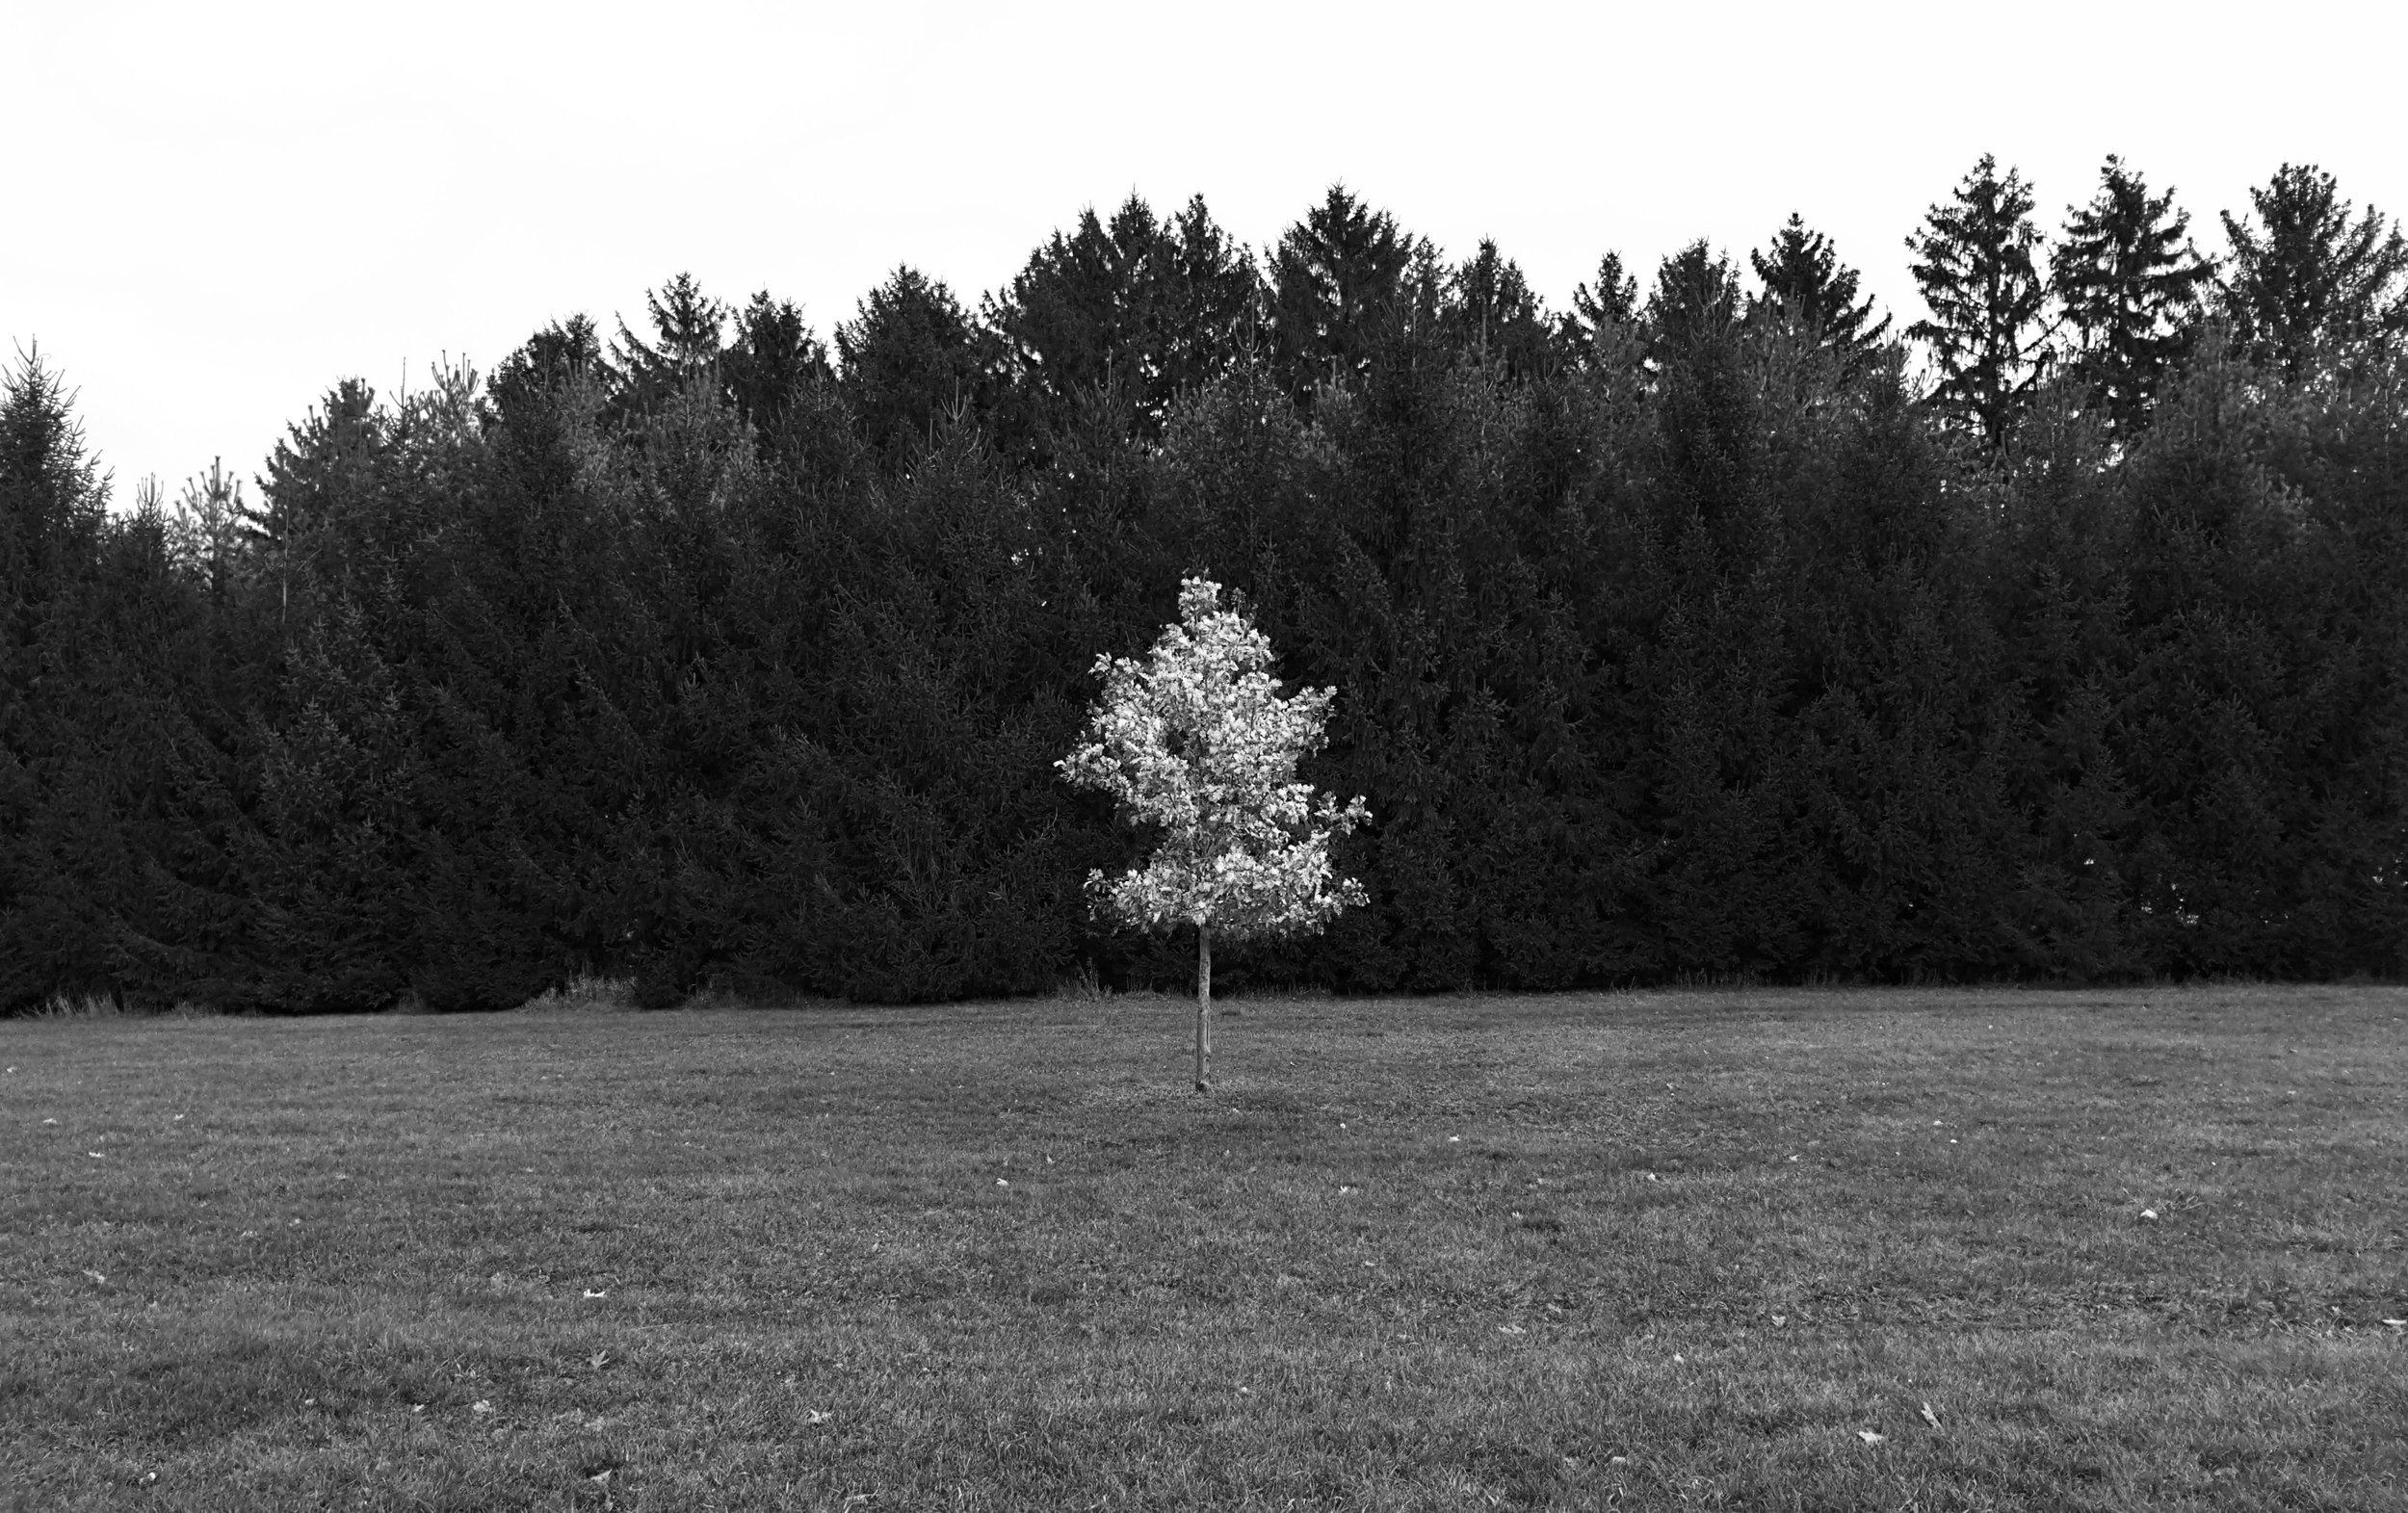 Tree B/W. Lussier Center. Madison, Wisconsin. December 2016. © William D. Walker